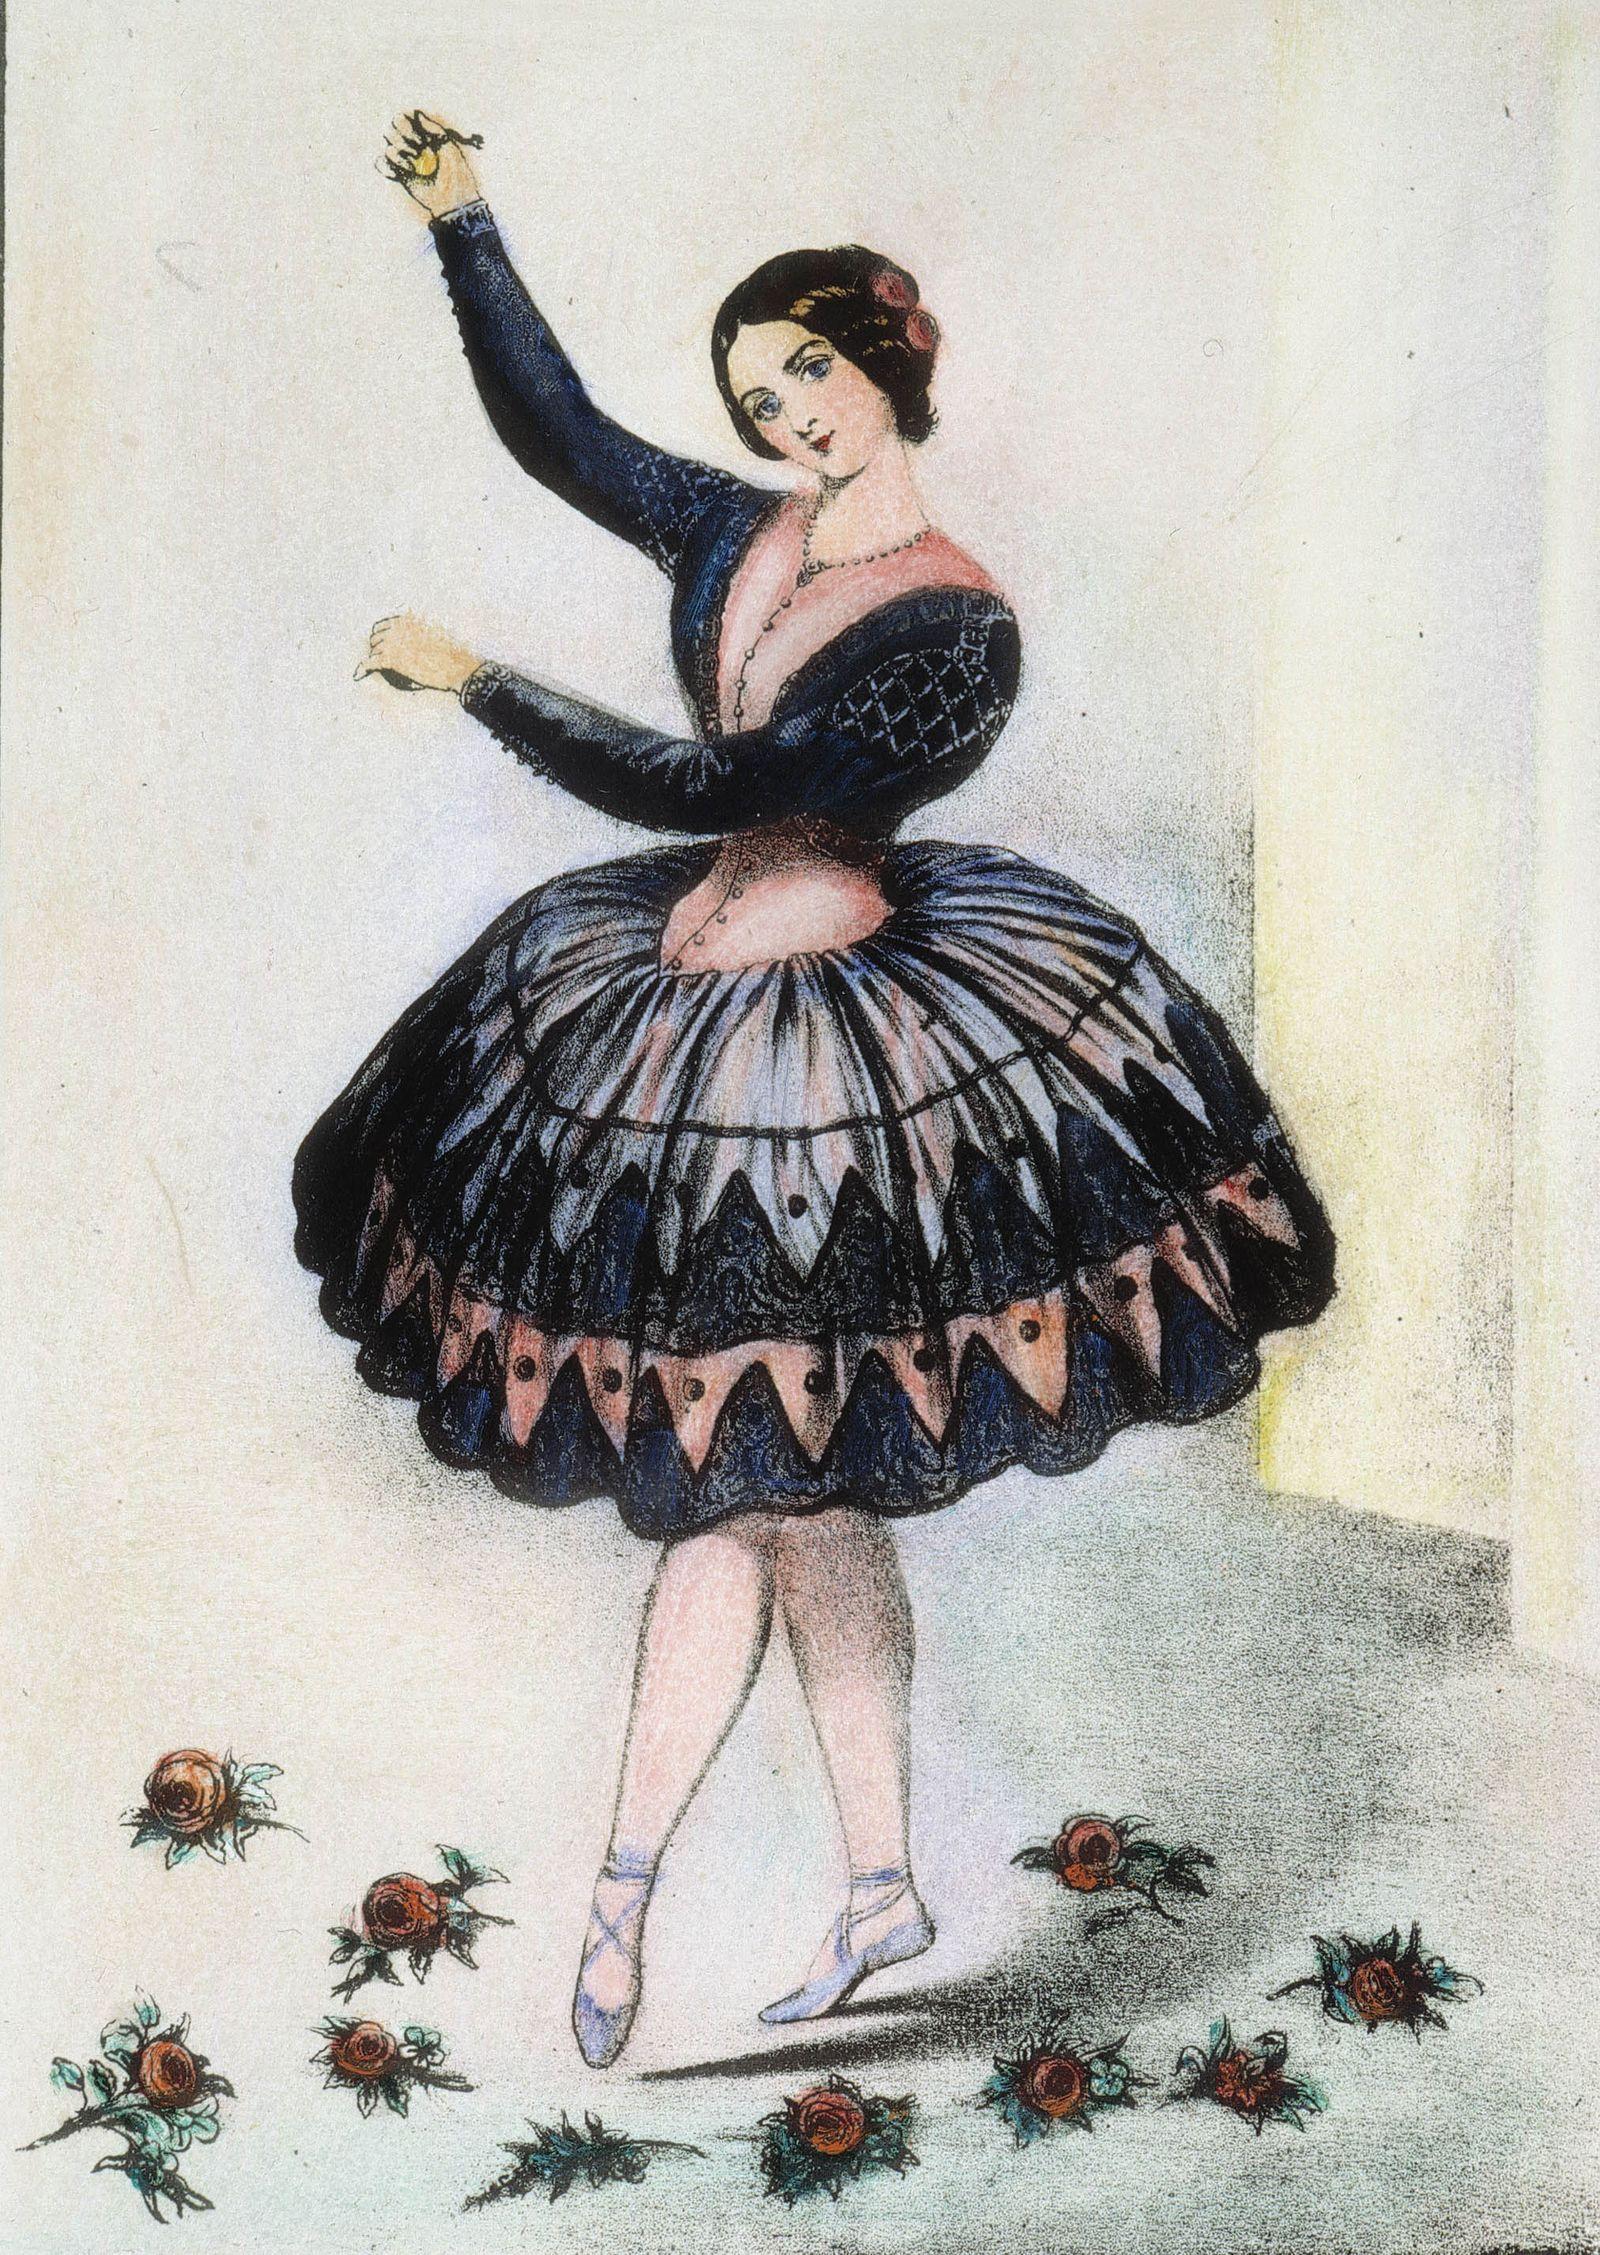 LOLA MONTEZ (1818-1861). NÈe Marie Dolores Eliza Rosanna Gilbert. Irish dancer and adventuress. Lithograph, 1851, by Nathaniel Currier.